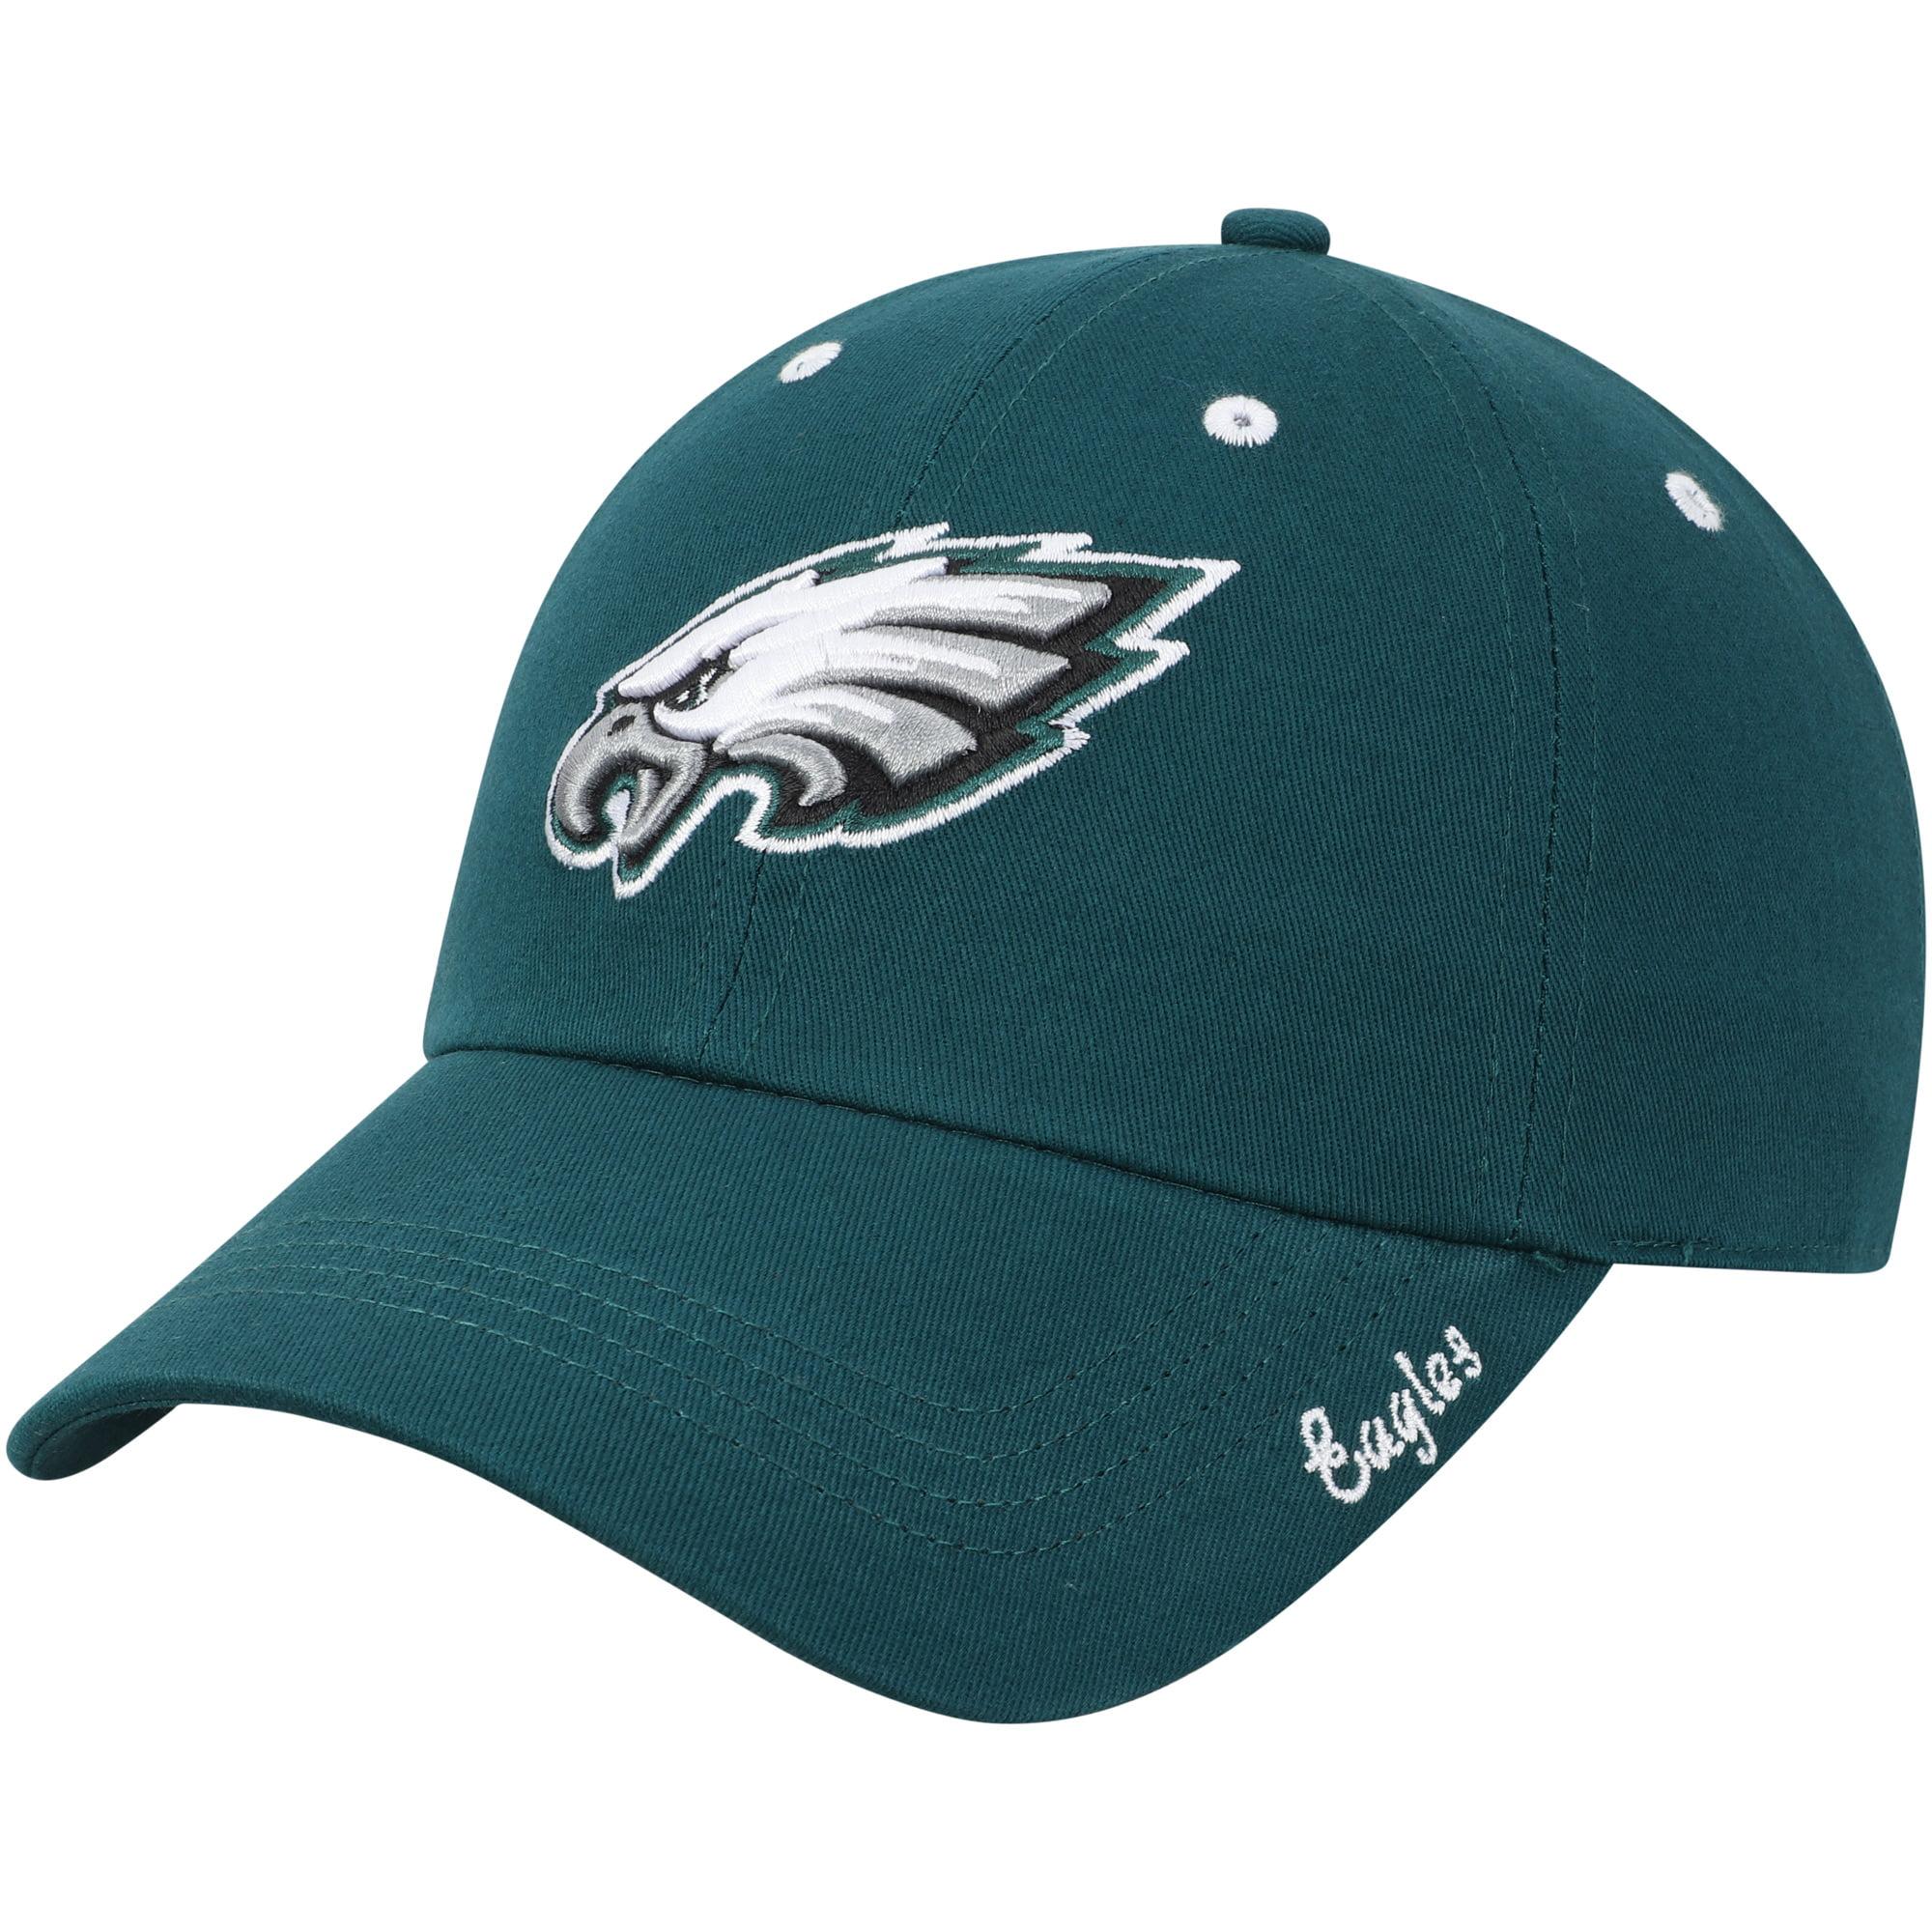 Men's Midnight Green Philadelphia Eagles Miata Adjustable Hat - OSFA